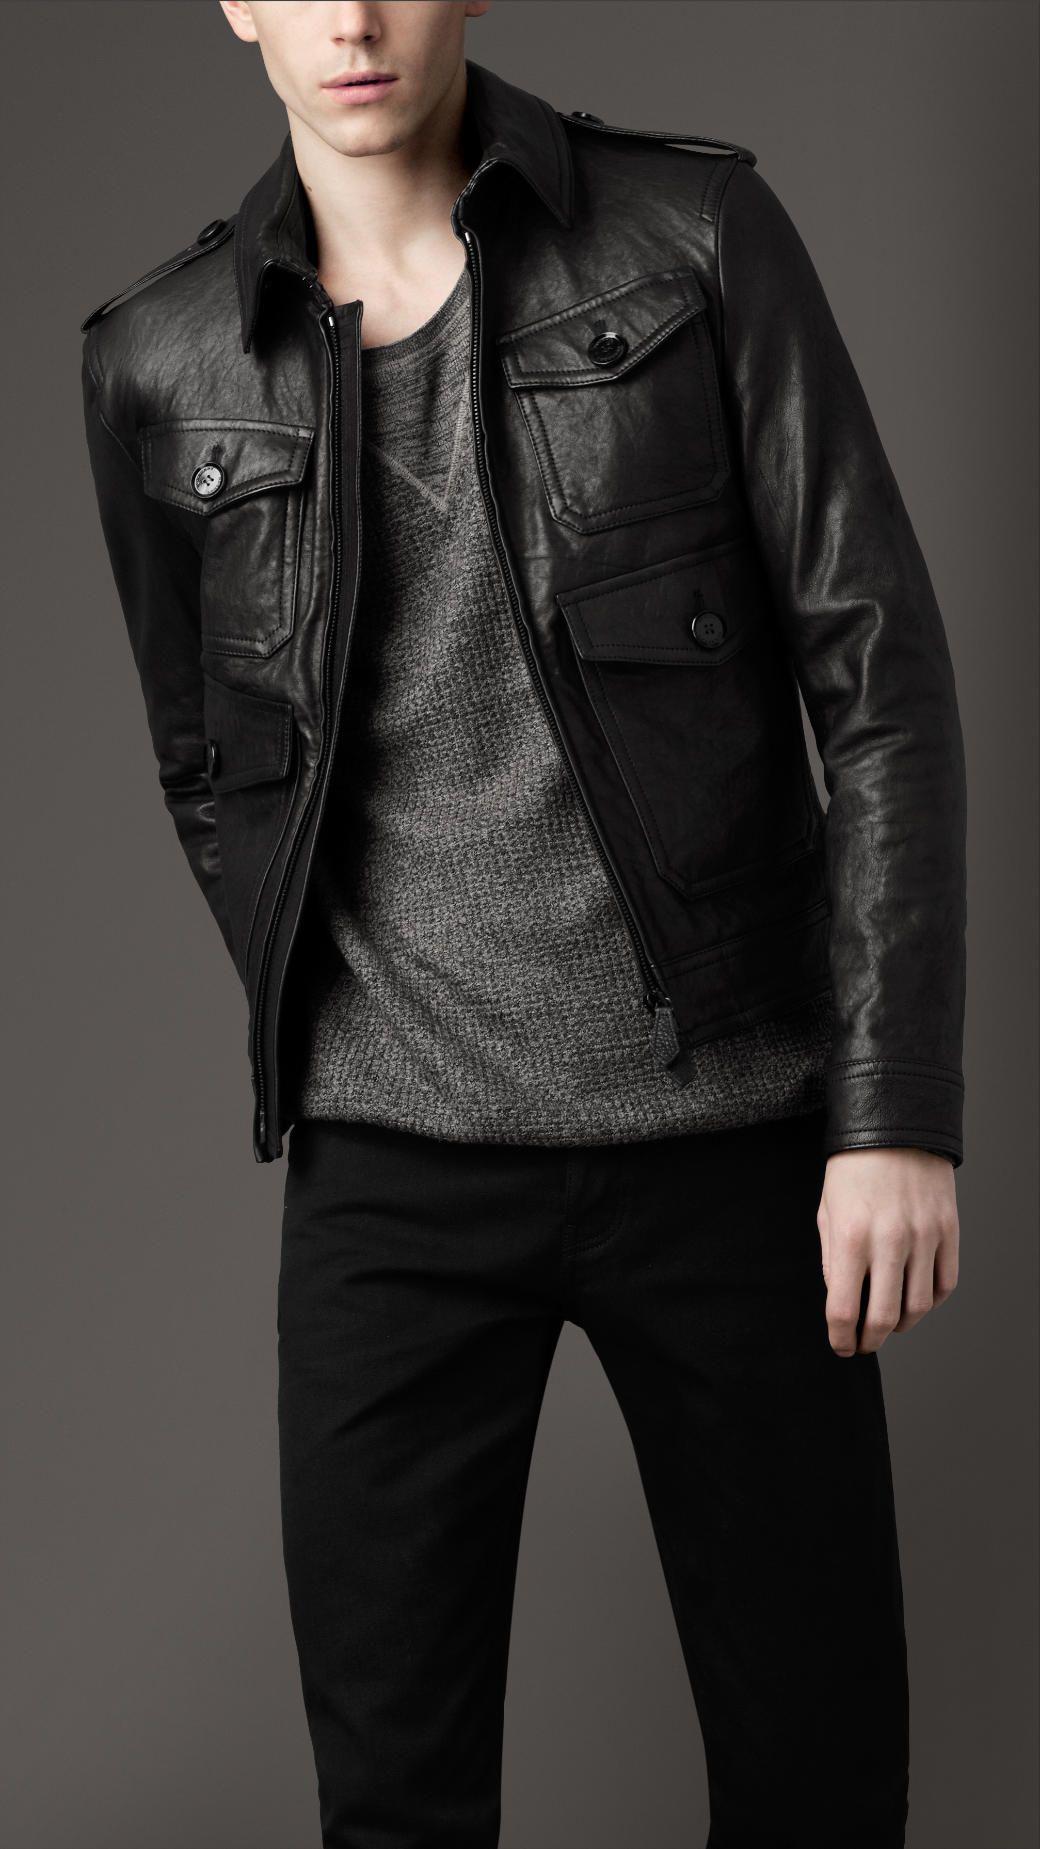 Men S Jackets Leather Bomber Jackets Burberry Official Leather Jacket Leather Jacket Men Mens Outfits [ 1849 x 1040 Pixel ]